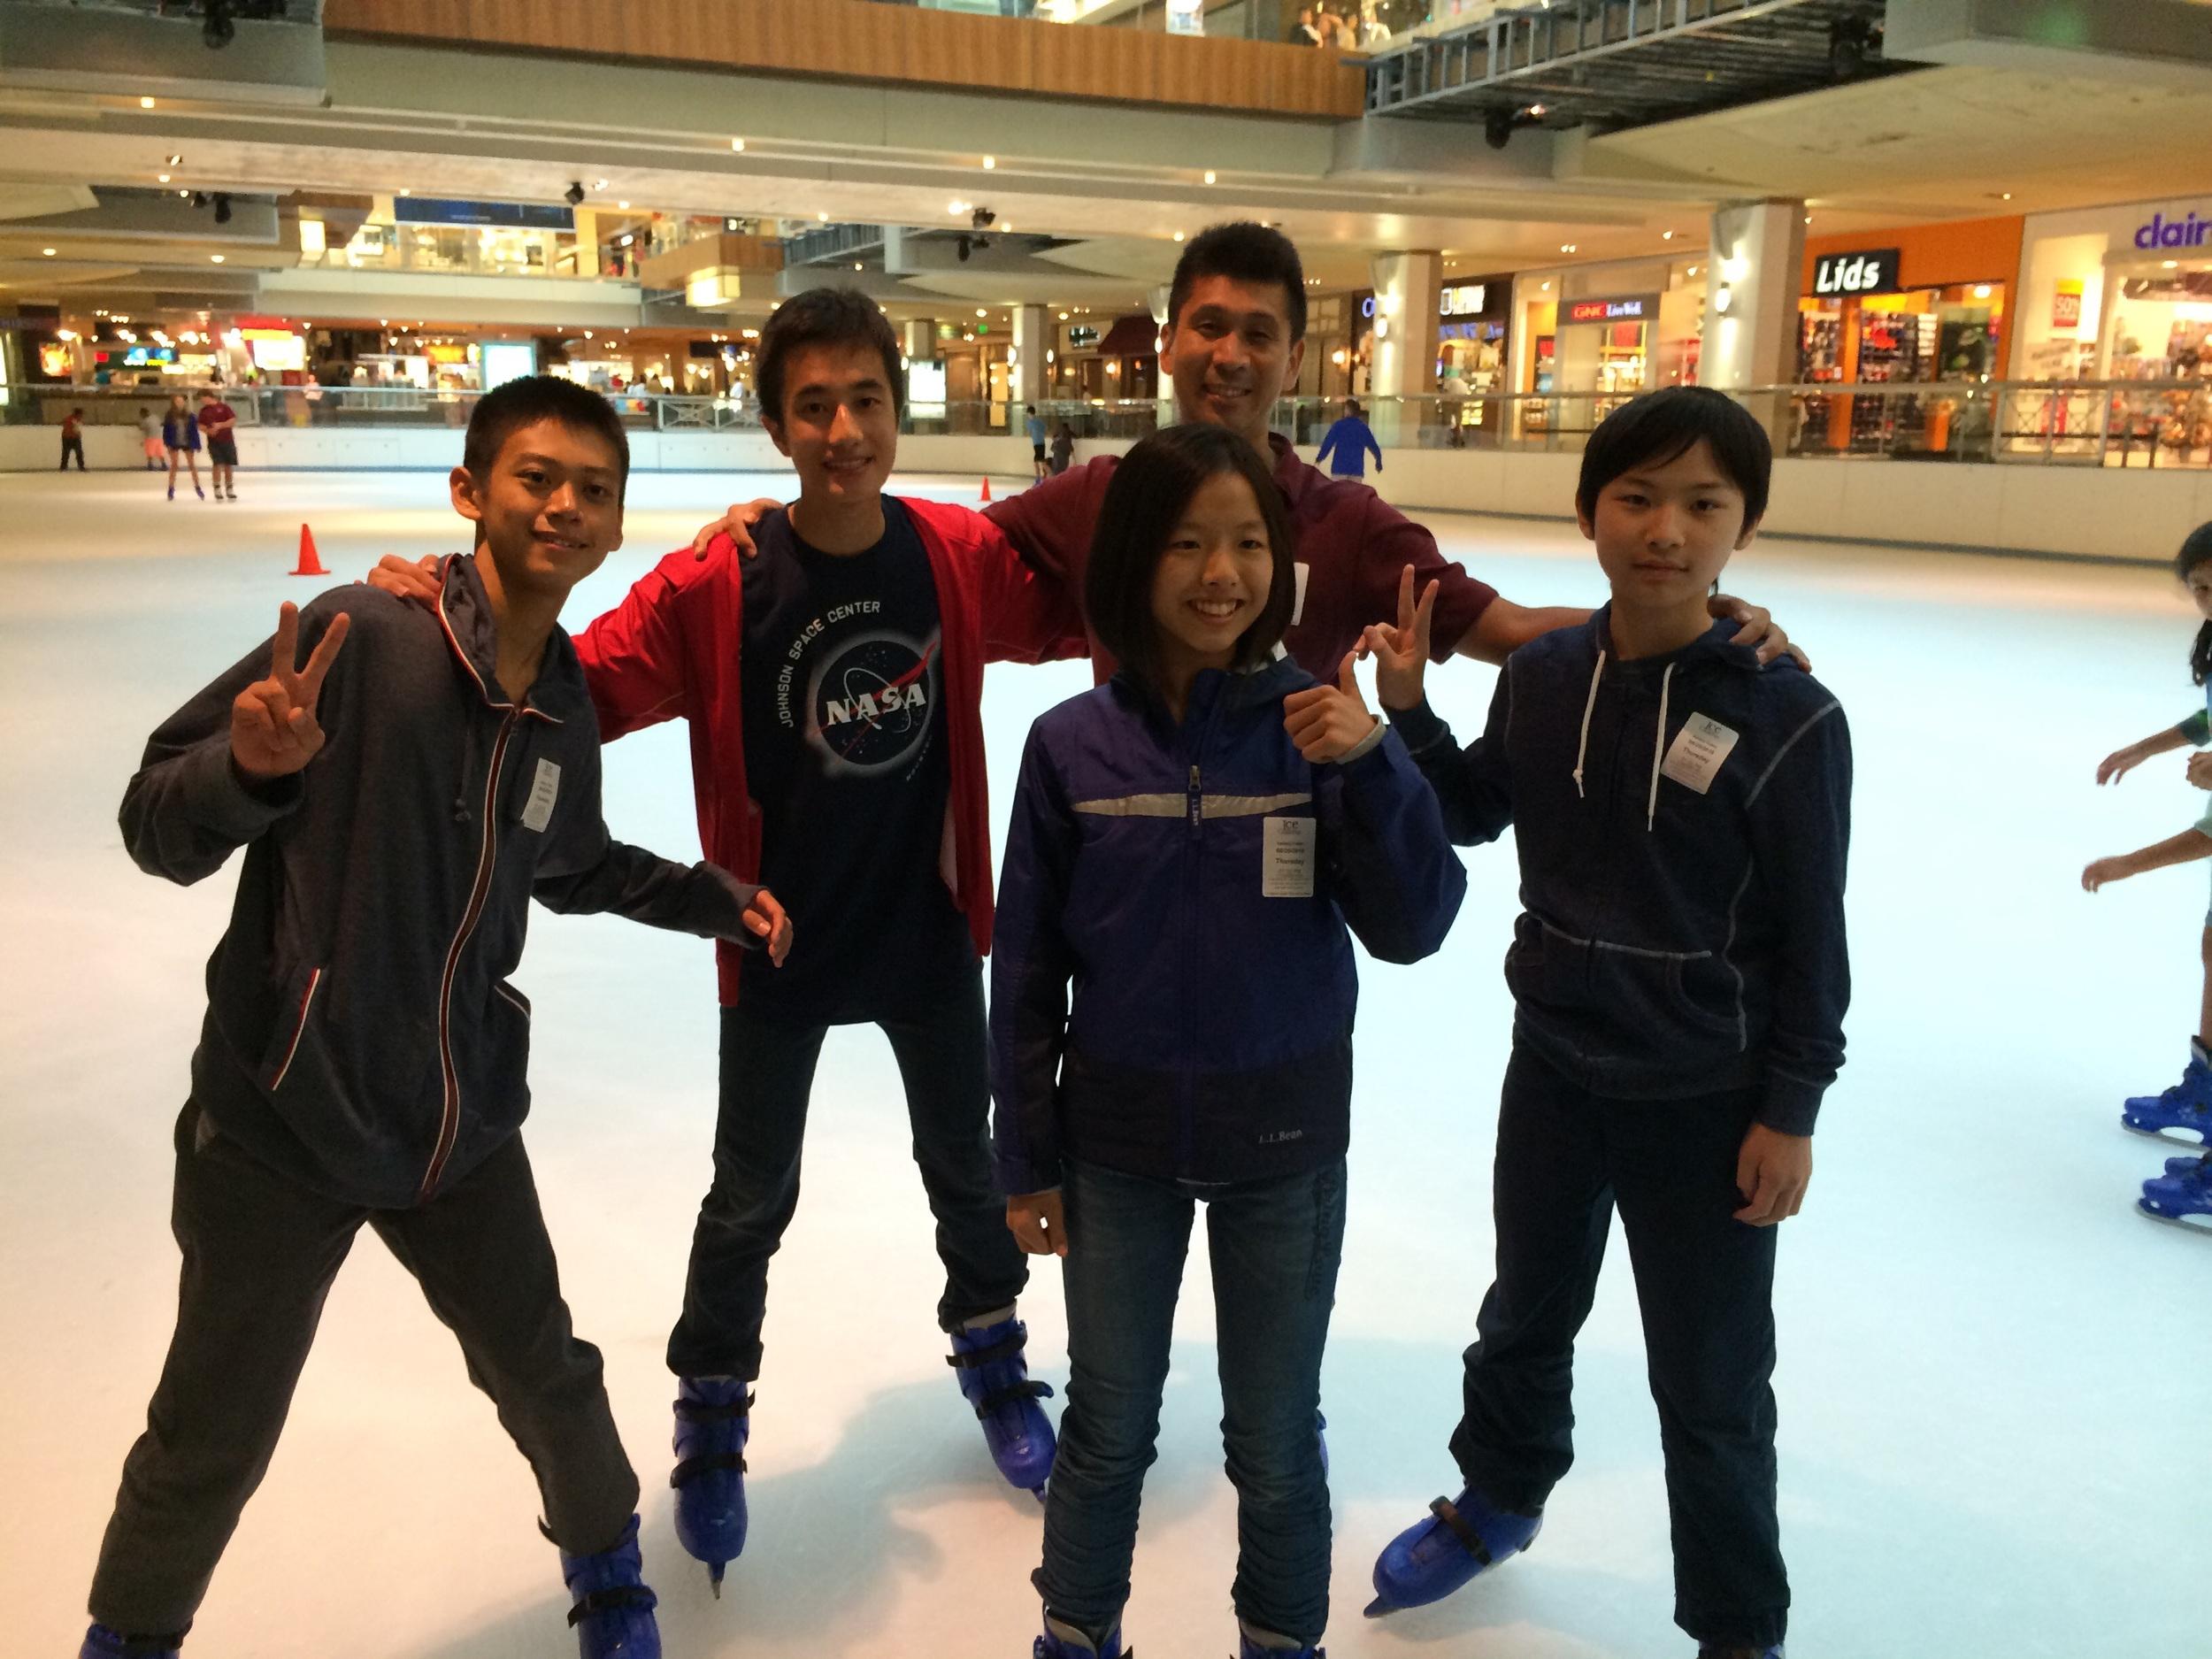 Group_IceSkating.jpg